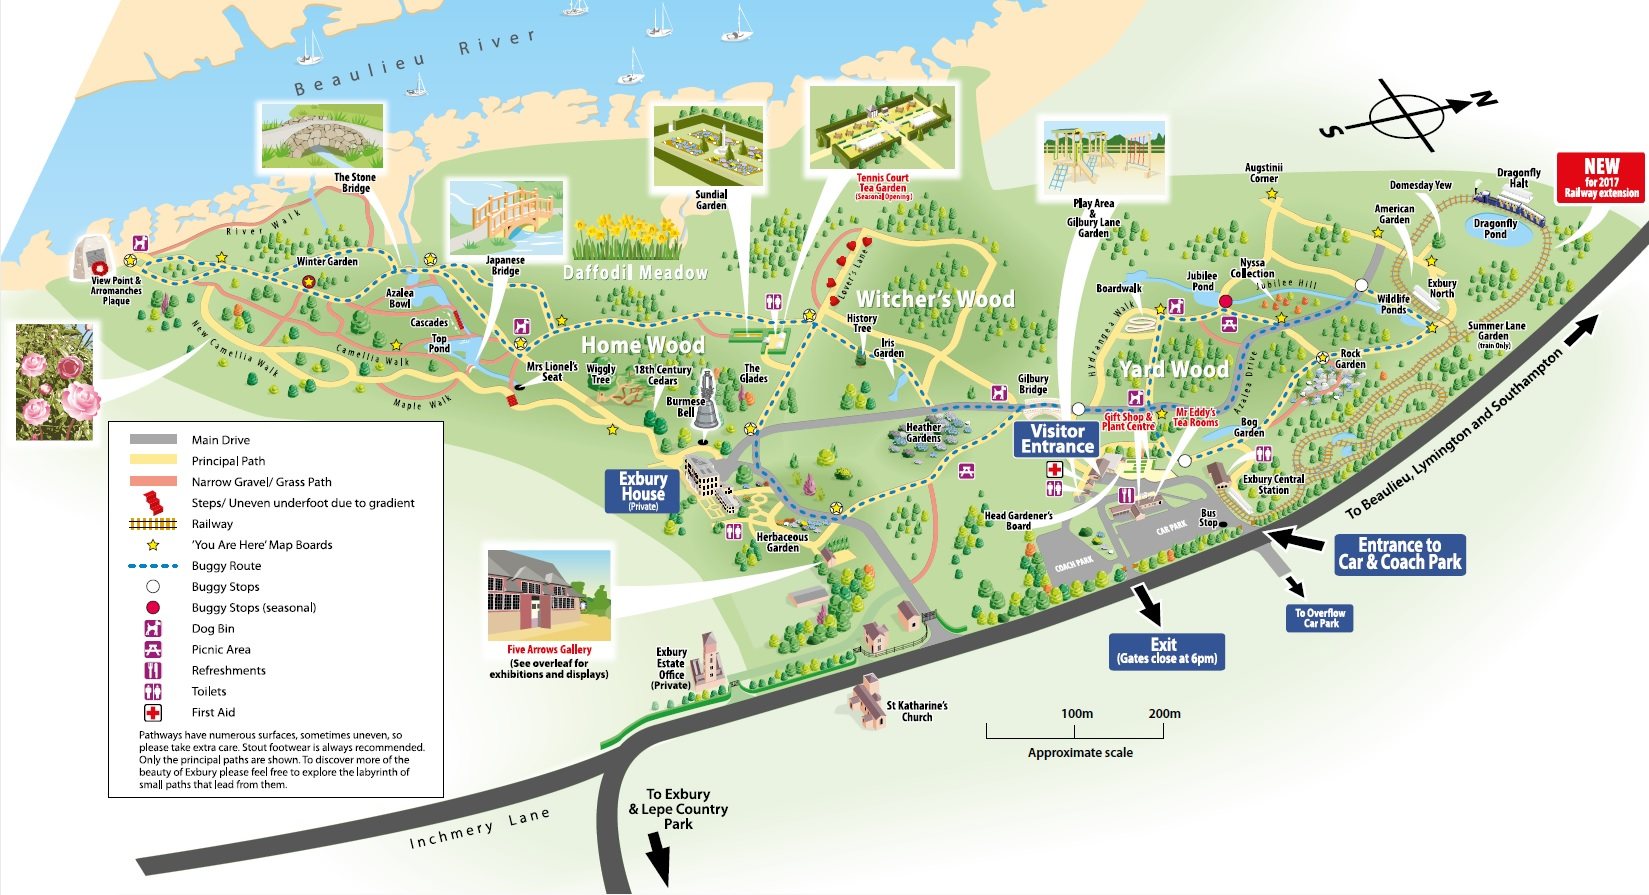 2018-08-14_Exbury-visitor-map.jpg